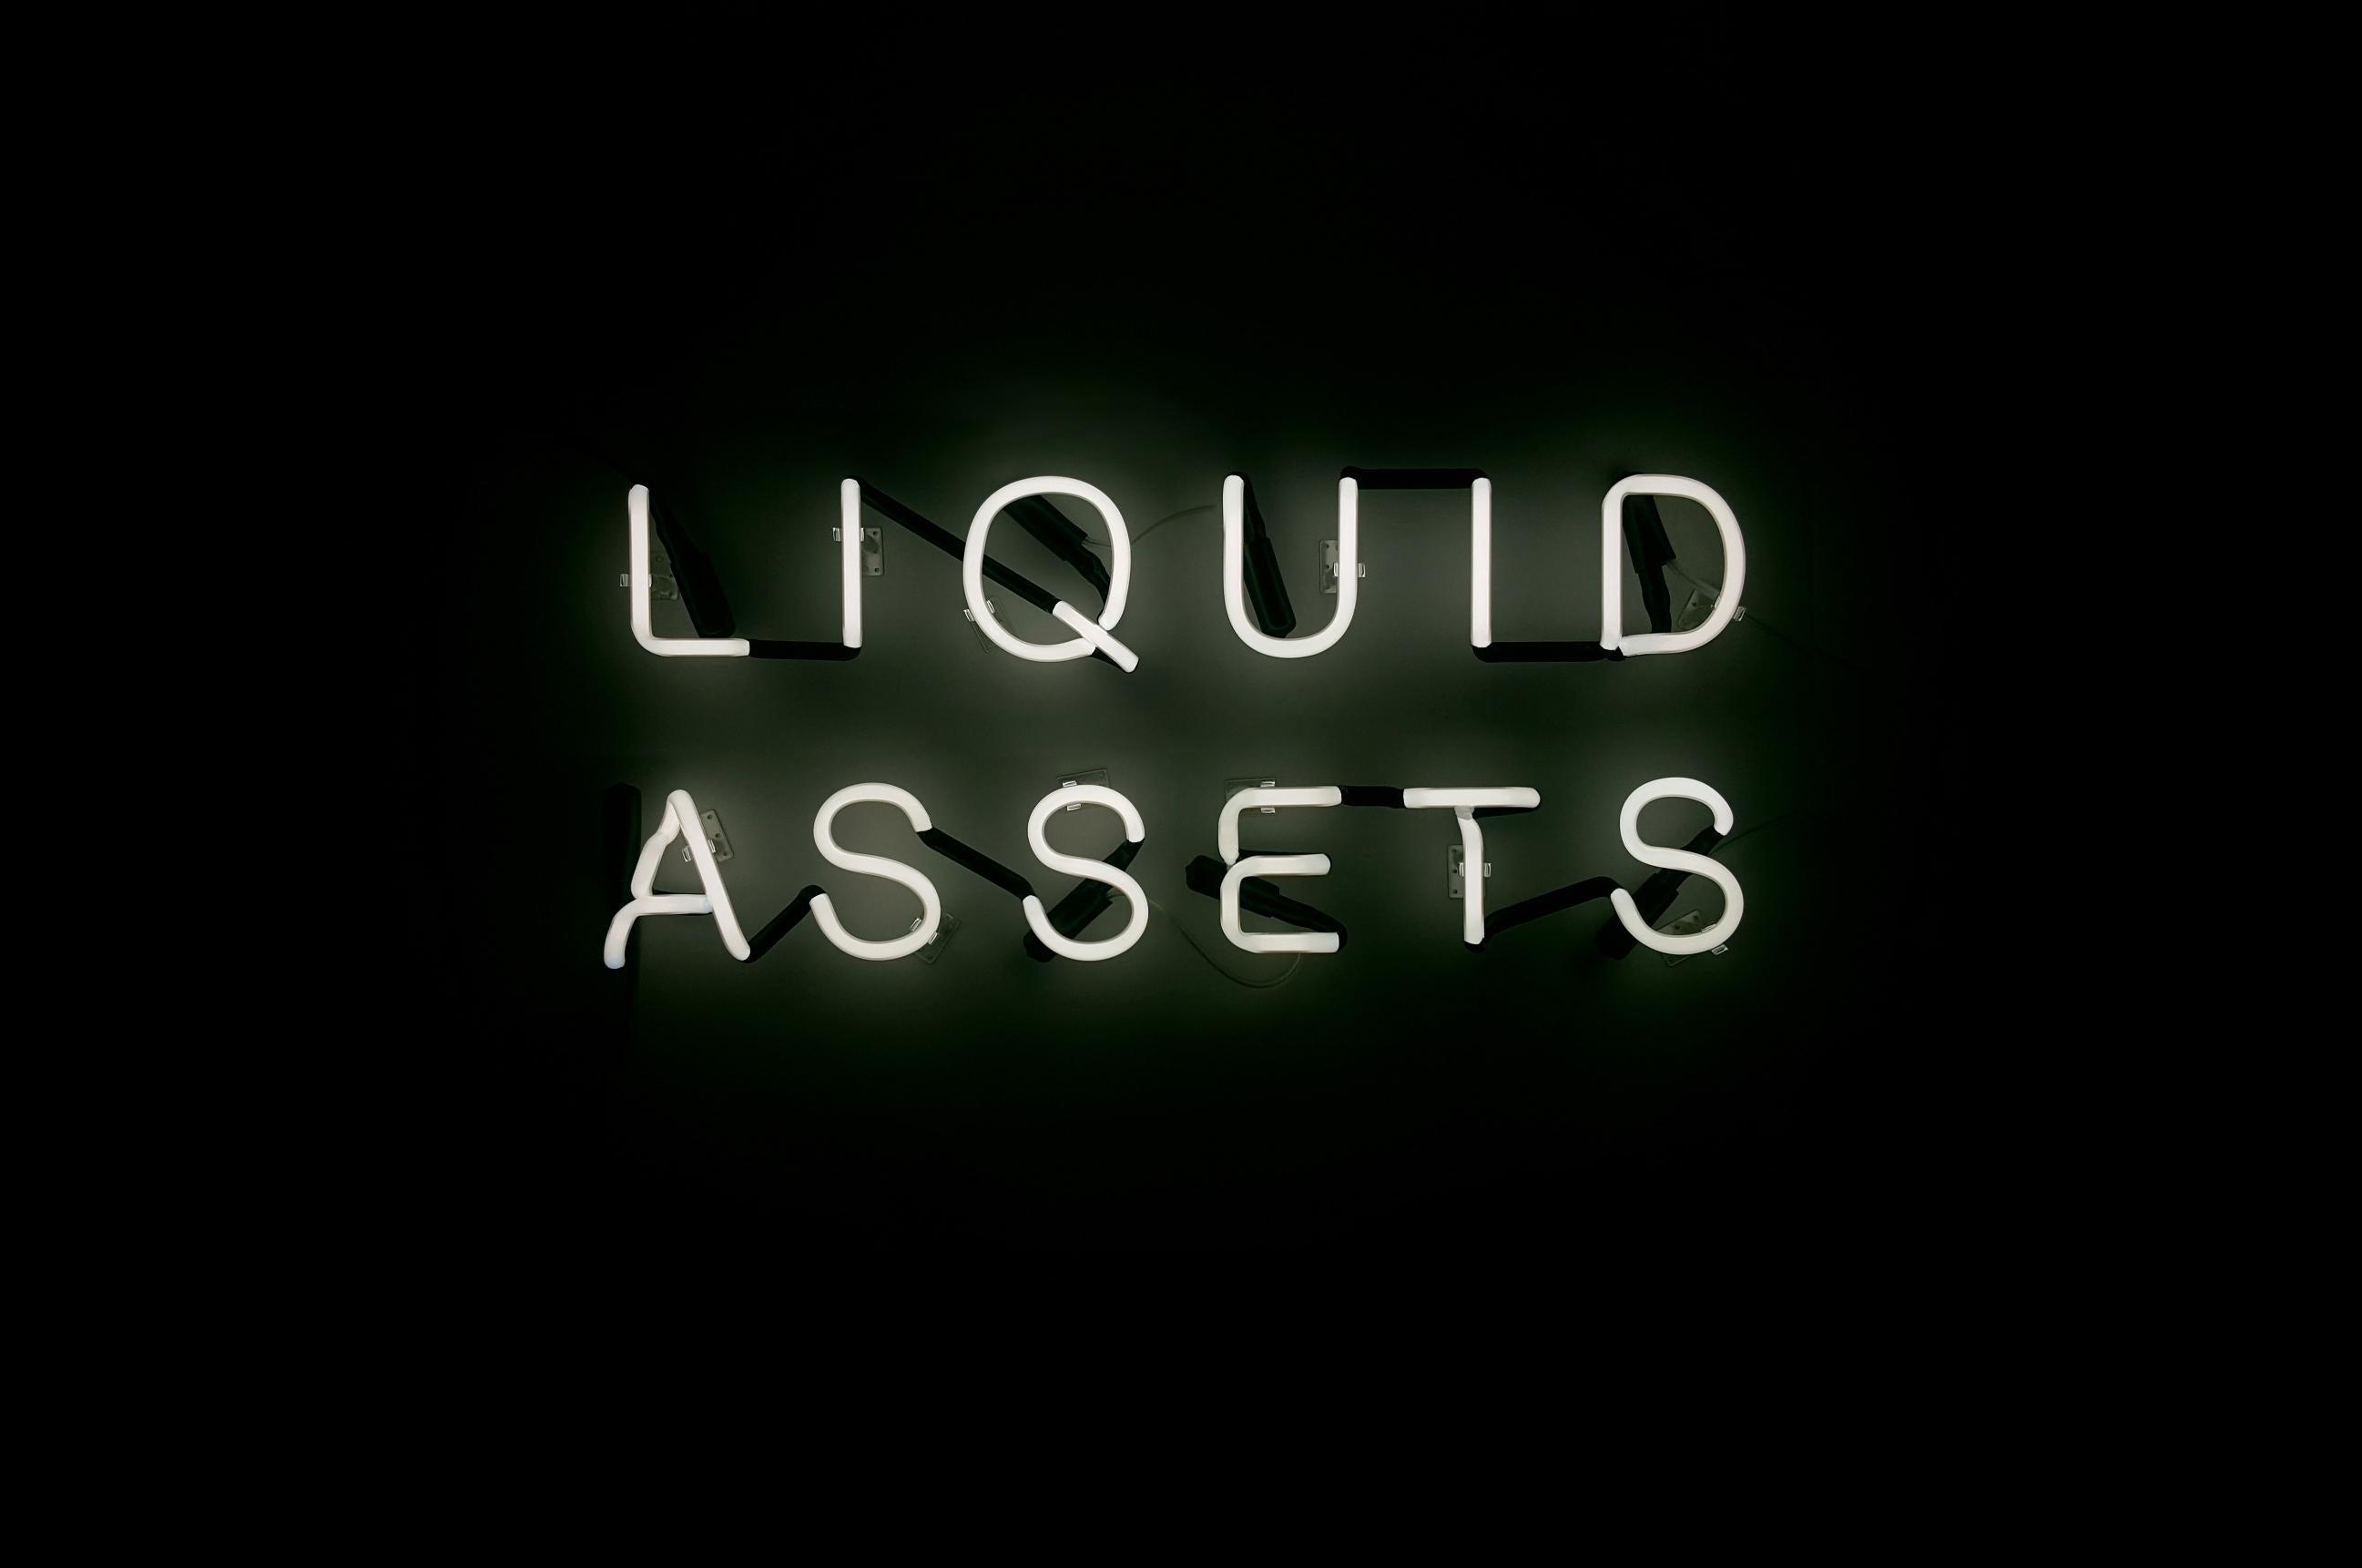 'Liquid Assets' Text-based White Neon Sign Light Lighting Art Sculpture Words